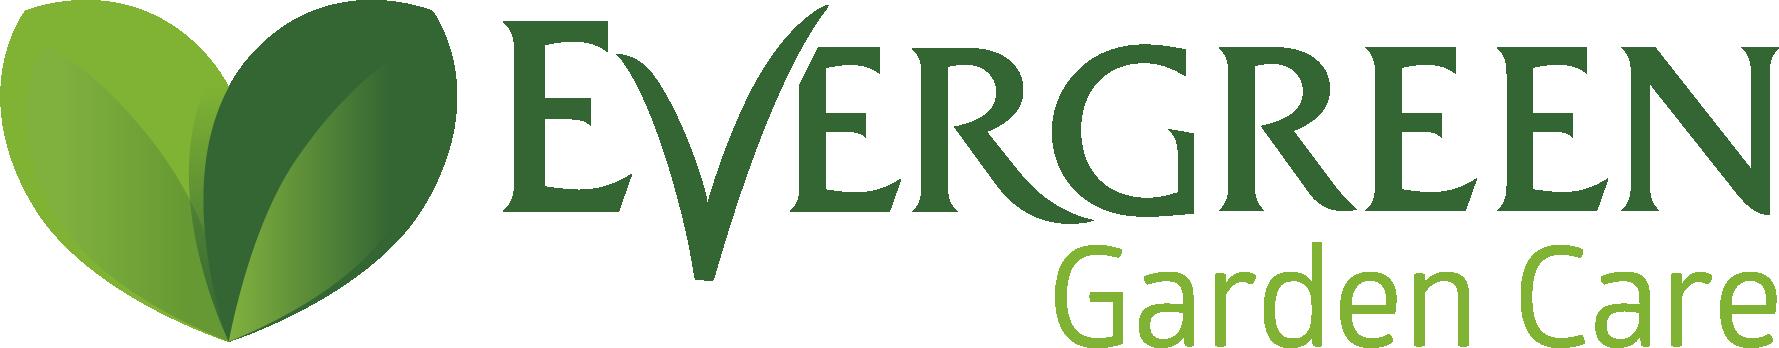 Evergreen Garden Care (UK) Ltd